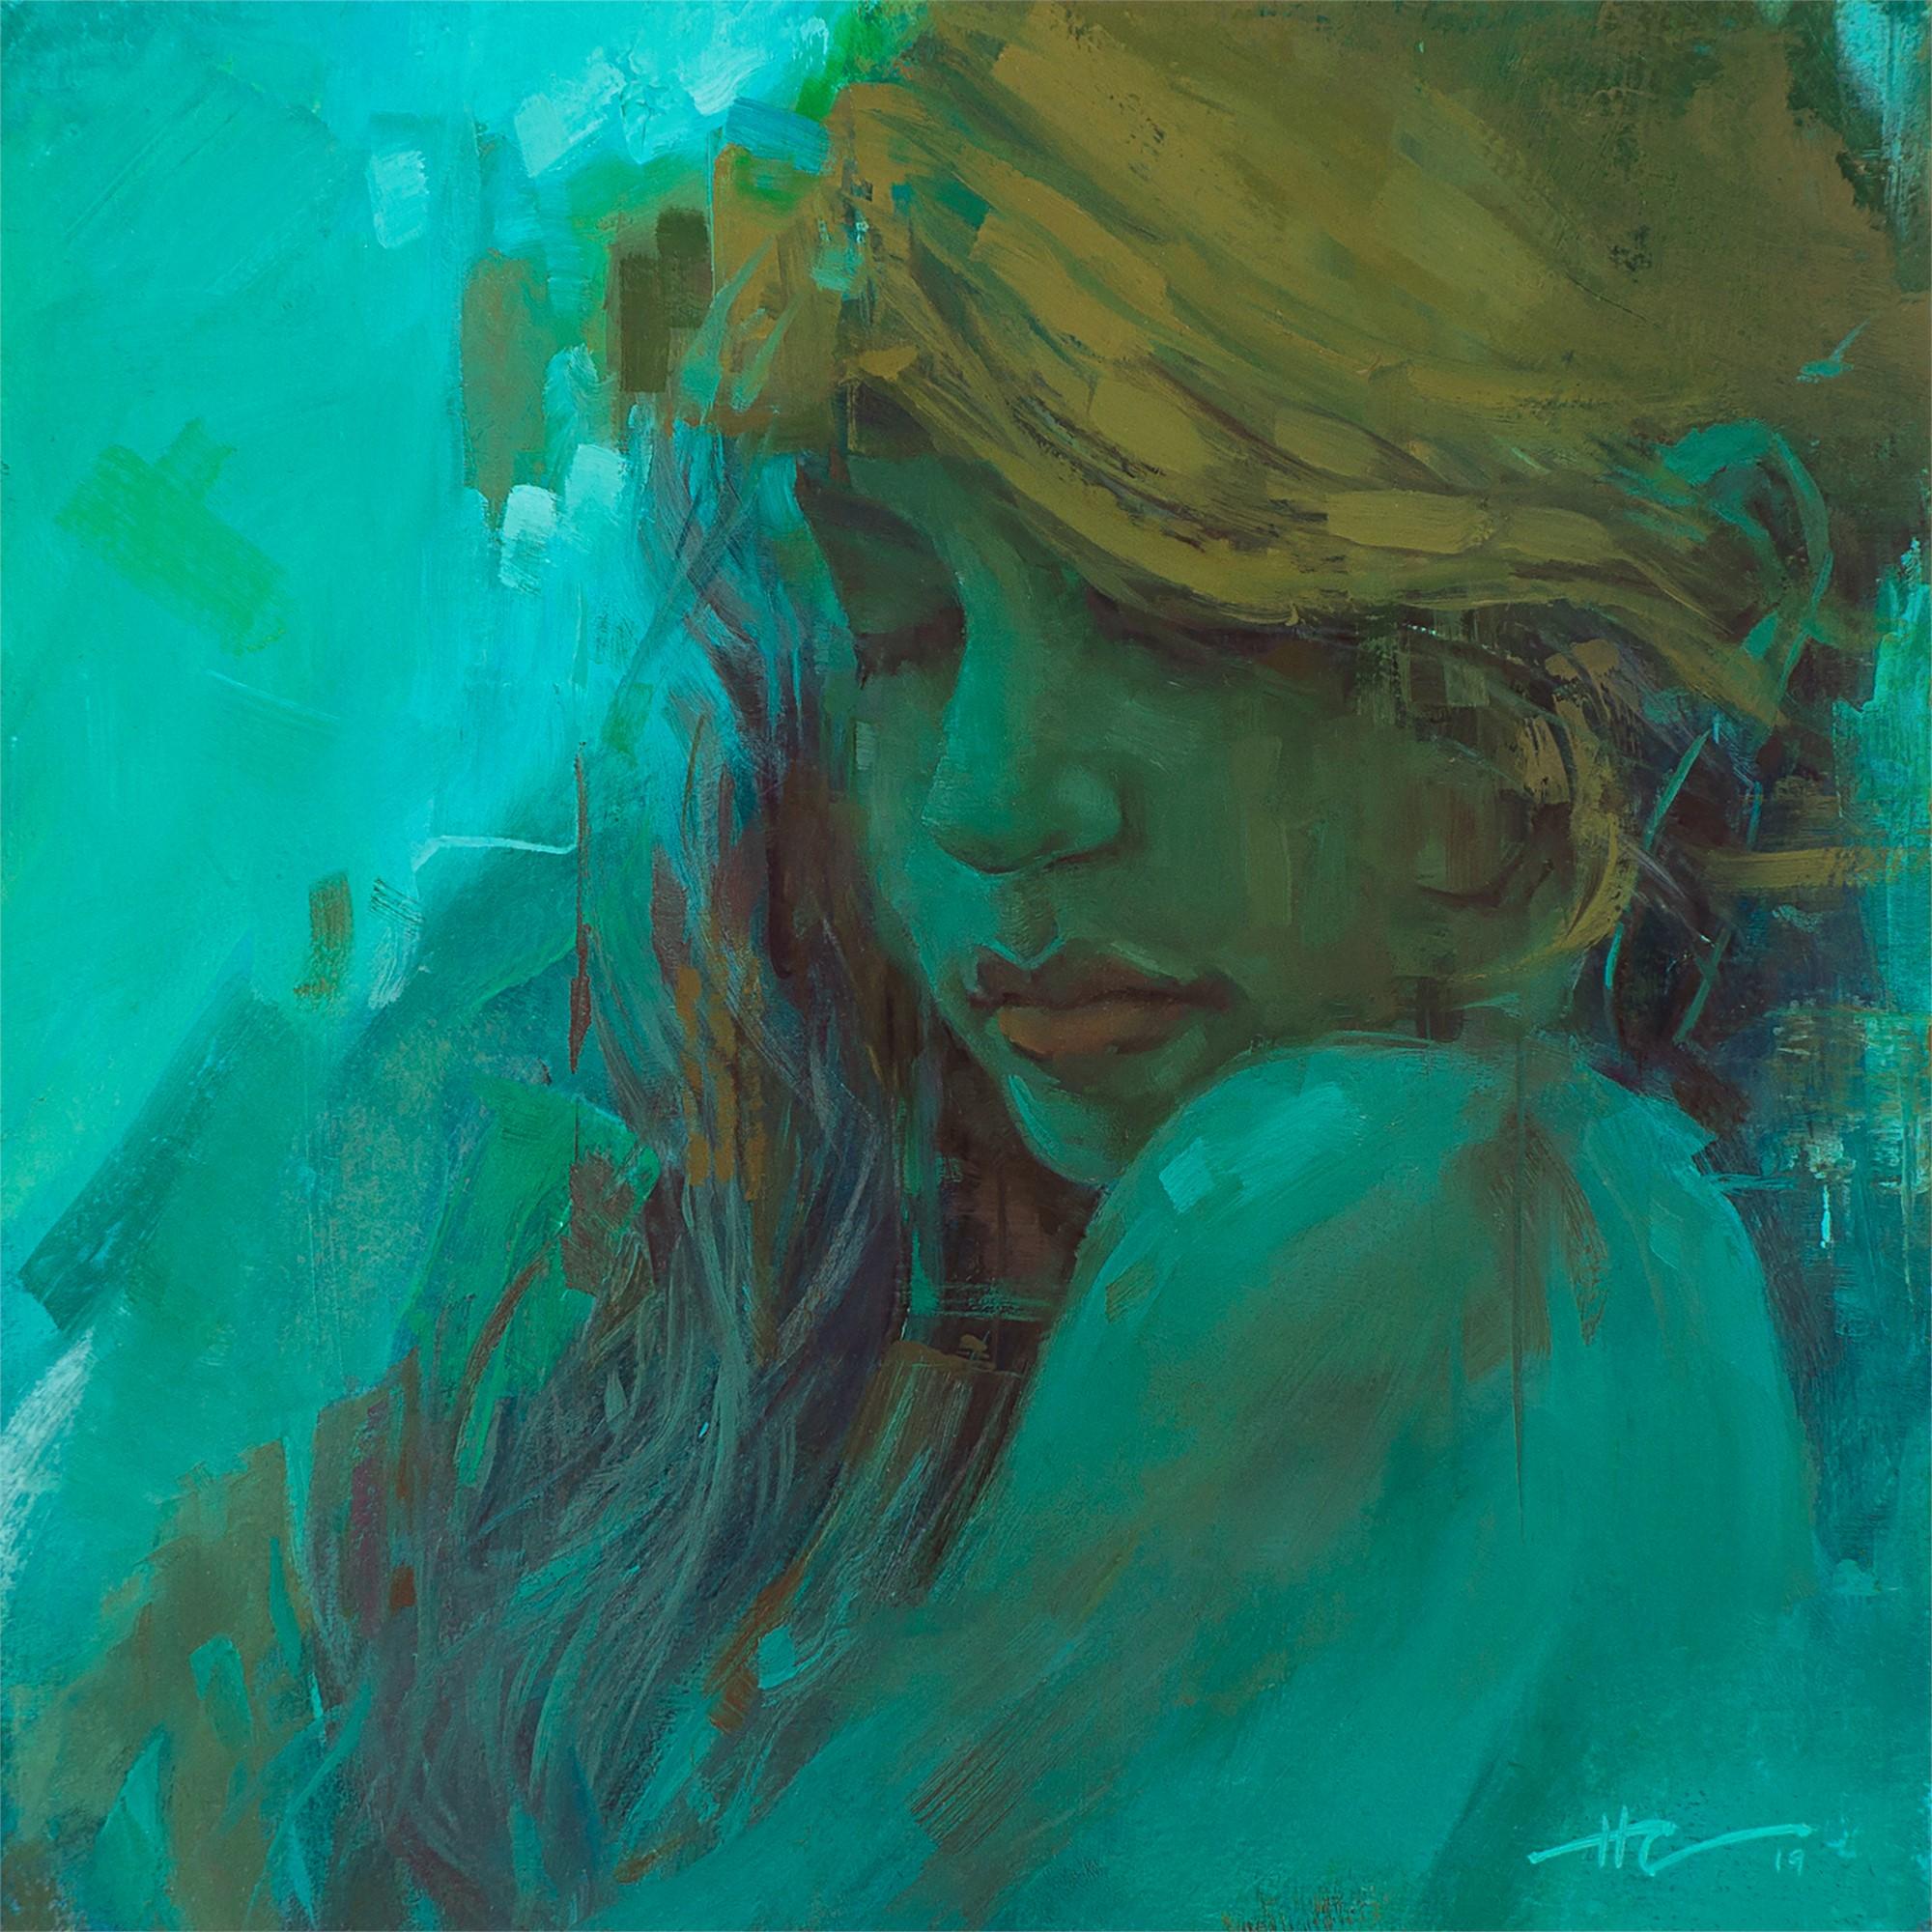 Glade by Hilary Clarcq